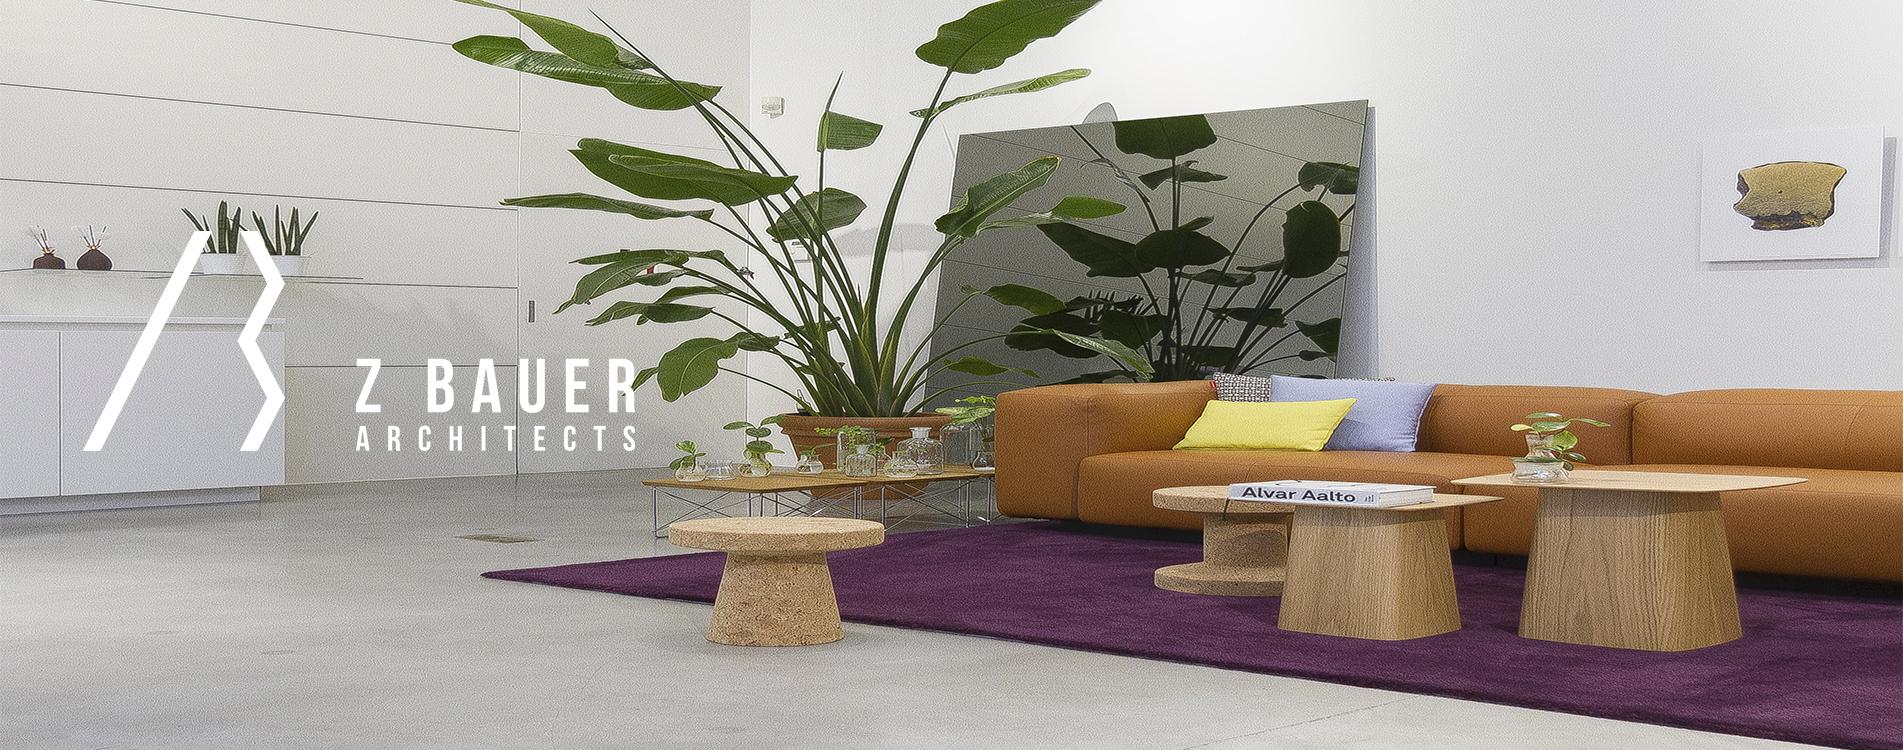 Zohrab Bauer Architects Green 1